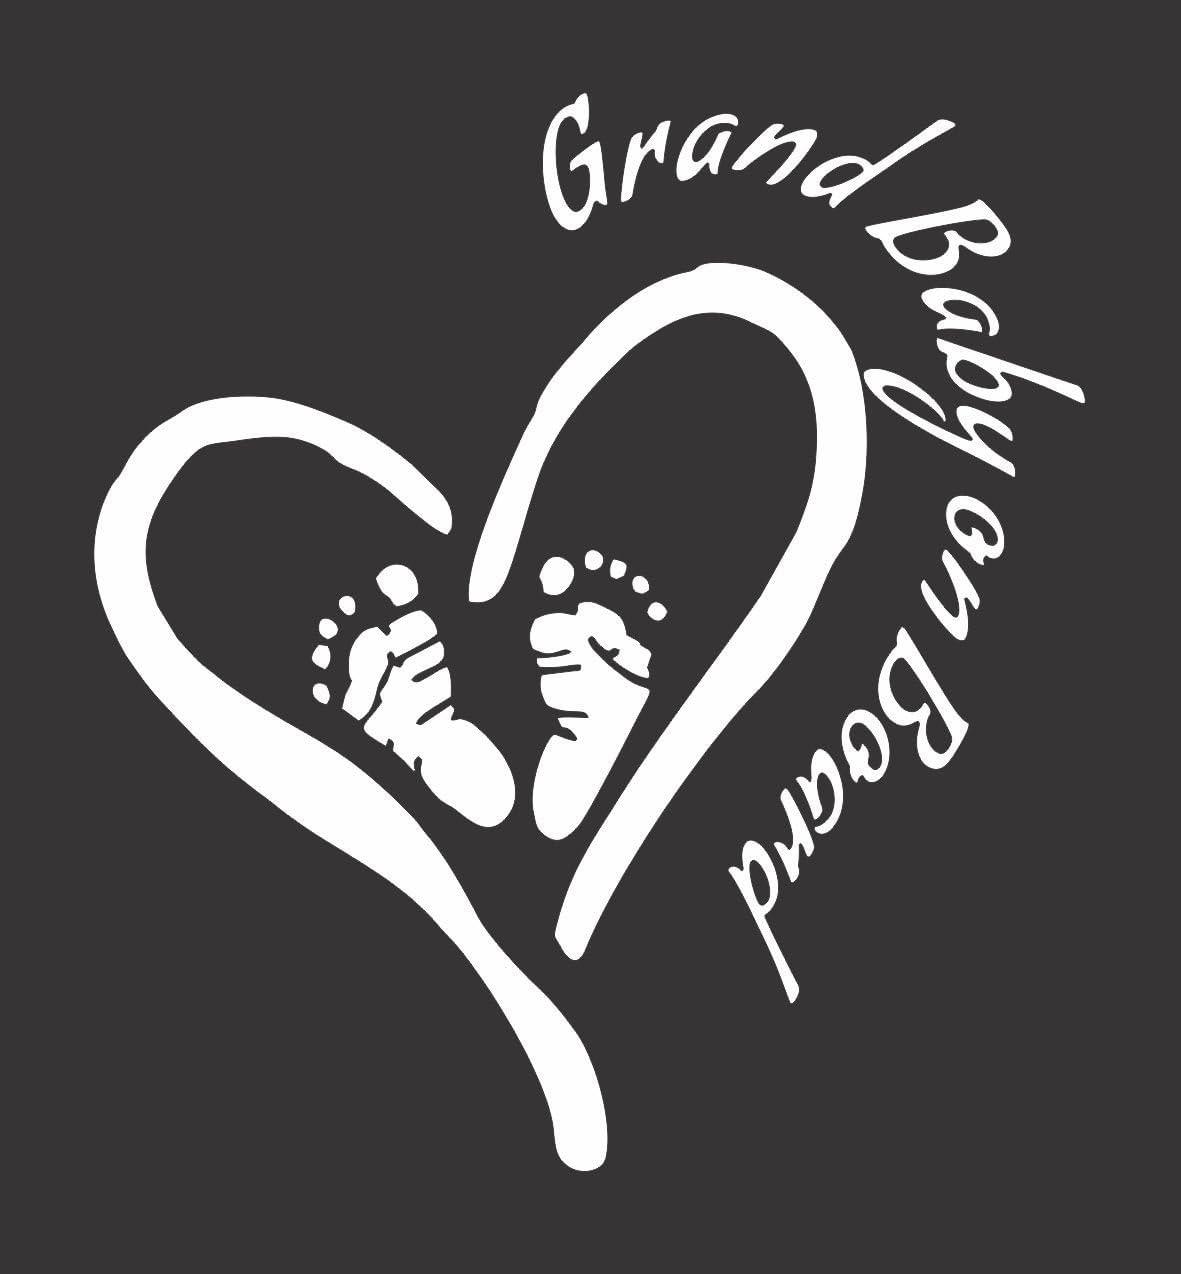 Grand Baby on Board Die Cut Vinyl Window Decal//Sticker for Car//Truck 5.5x6 Heart//Feet